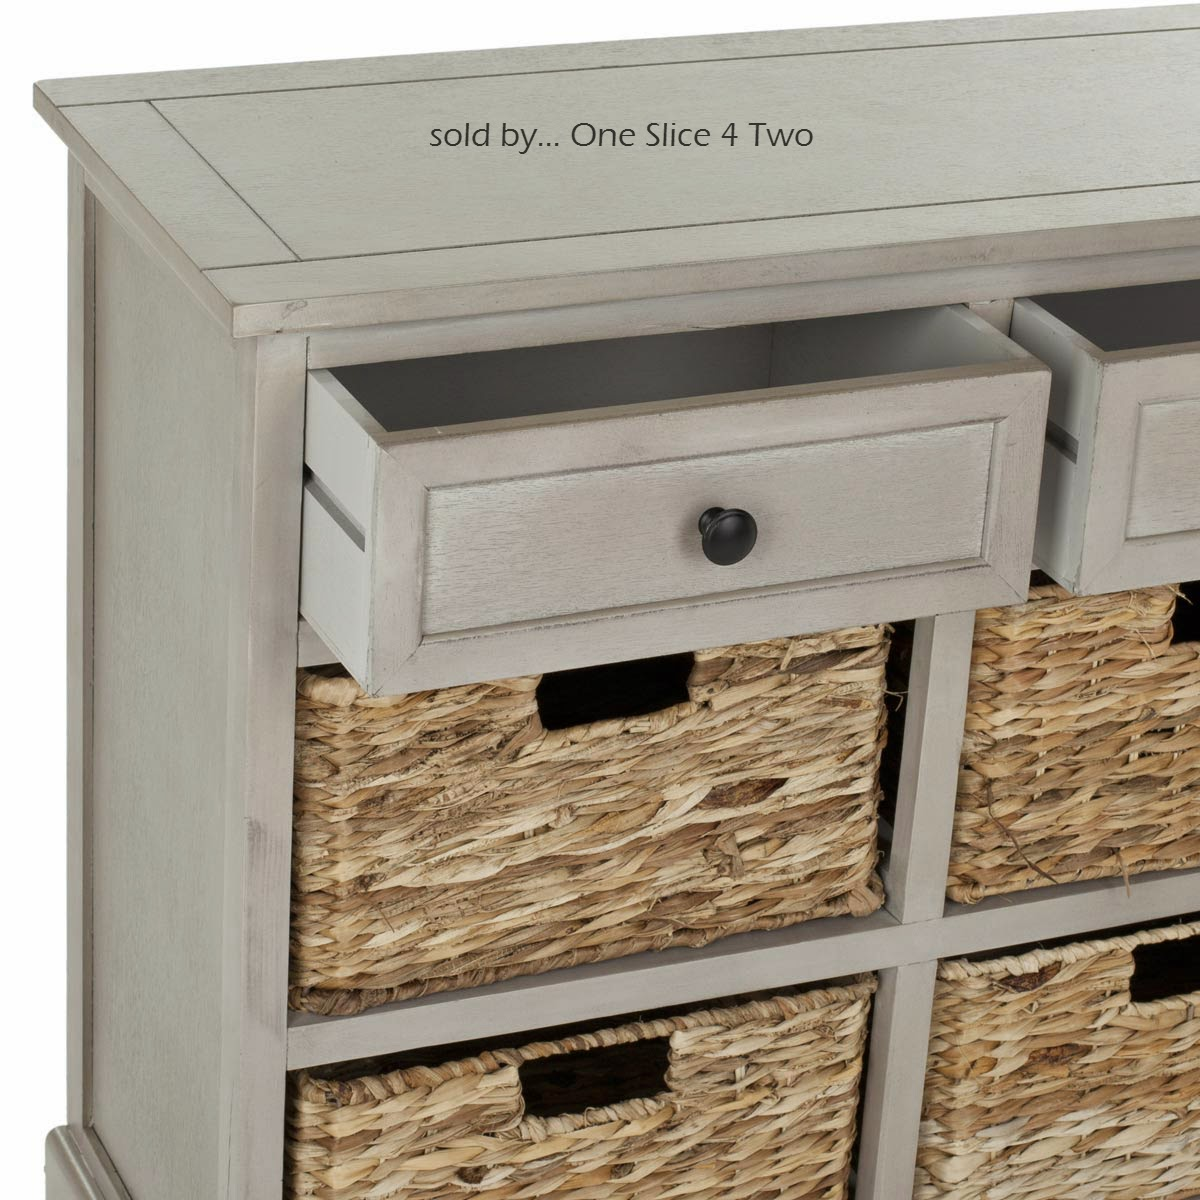 Storage Unit Drawer Wicker Basket Rattan New Handle Hamper 6 Cabinet  Handmade Rustic Bin Pine Vintage